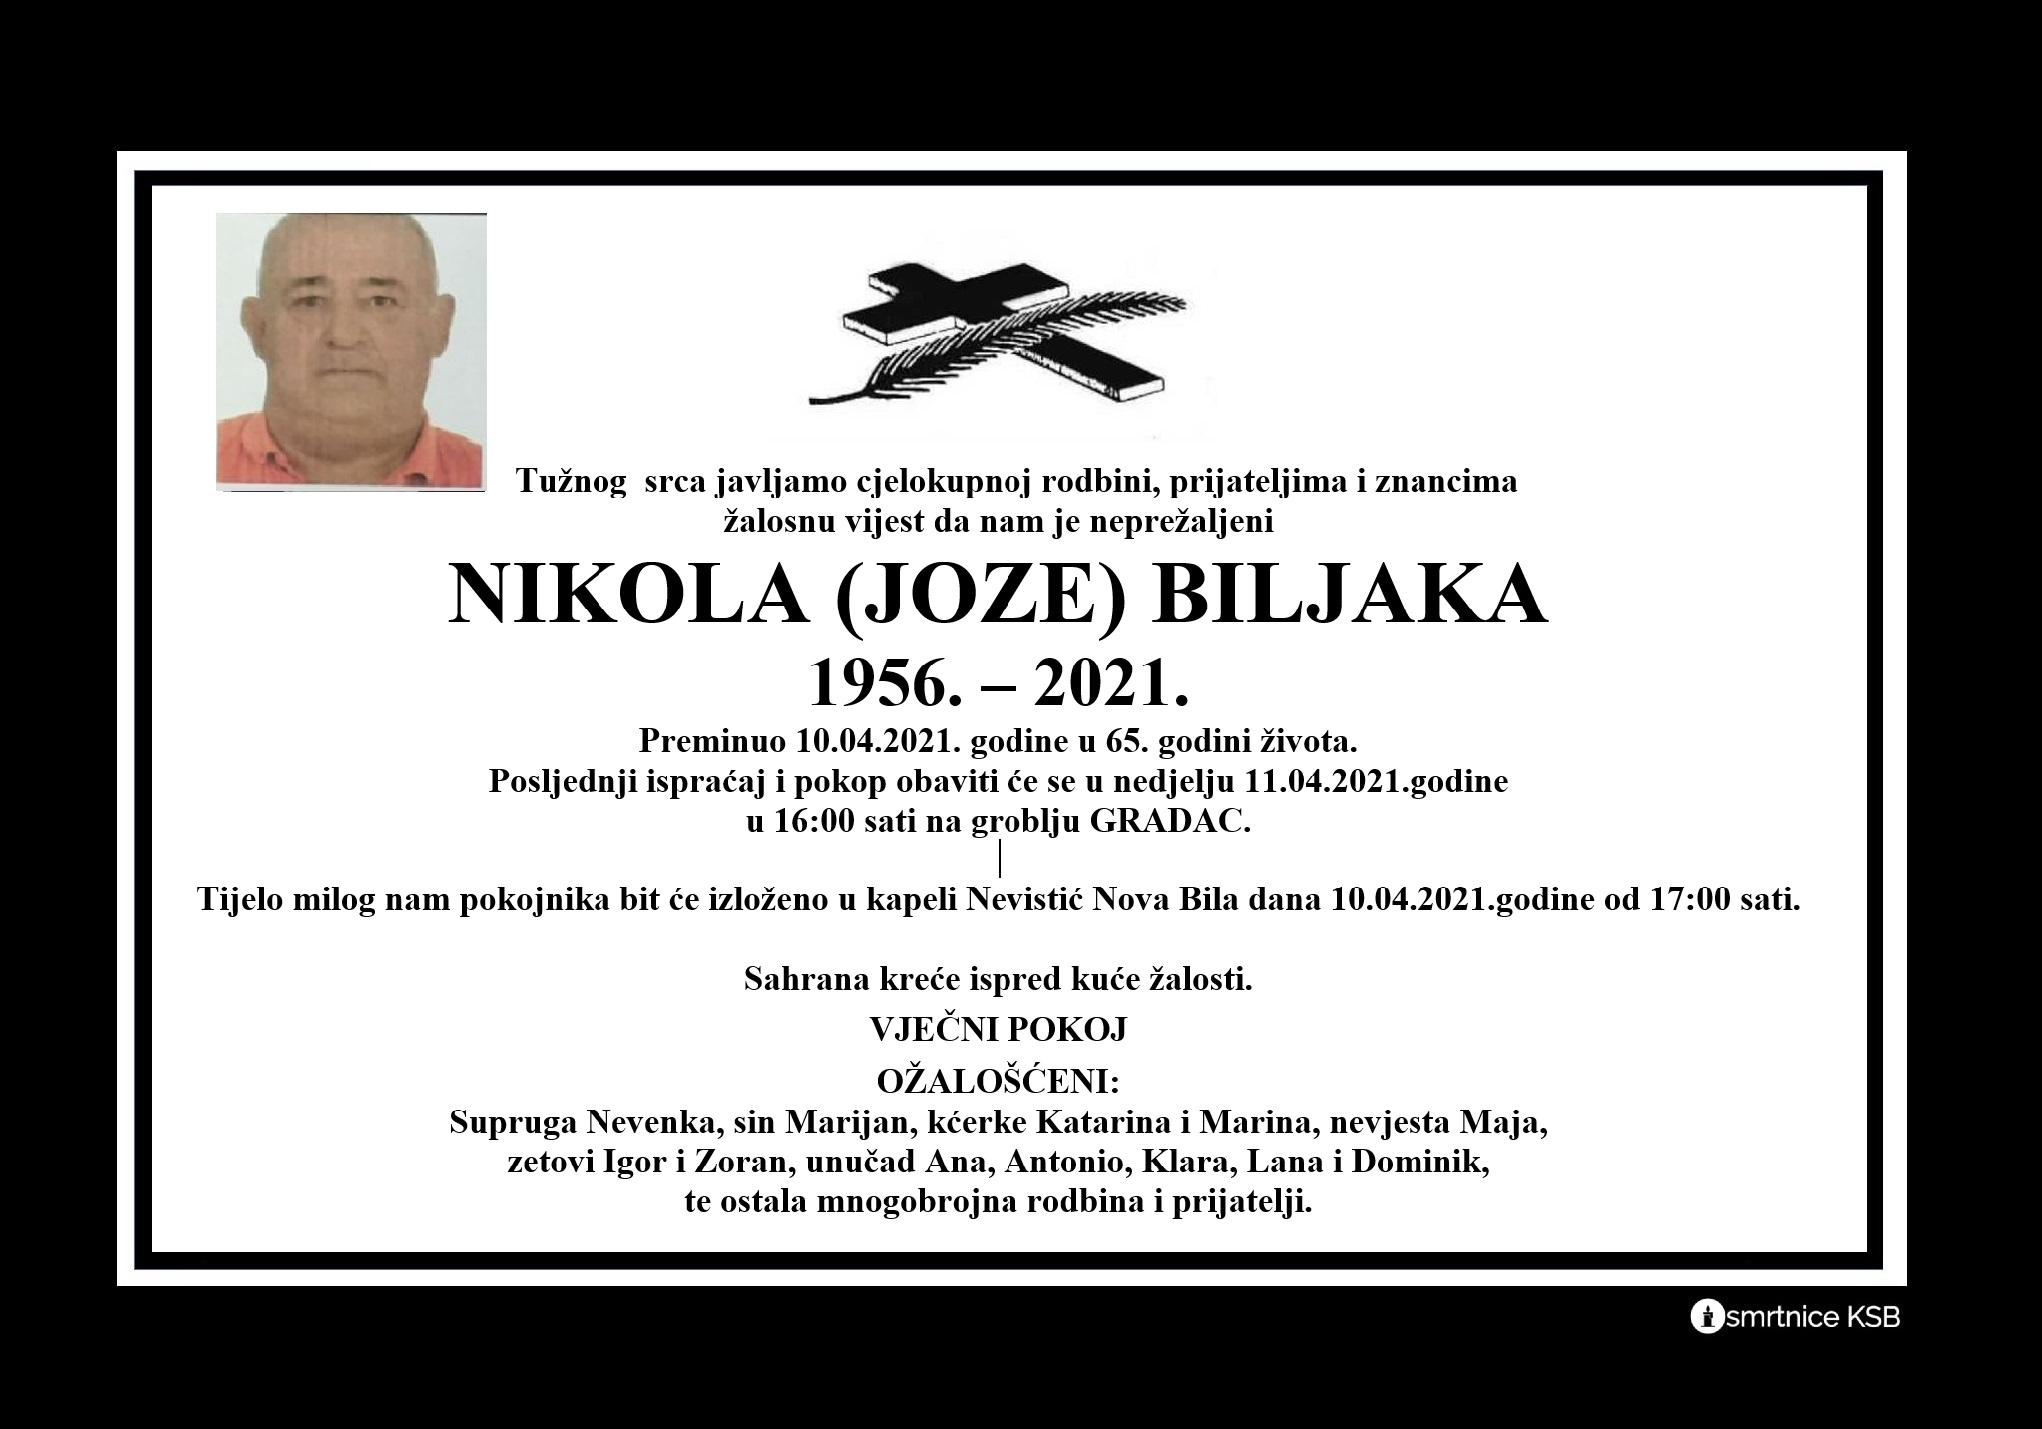 Nikola (Joze) BIljaka